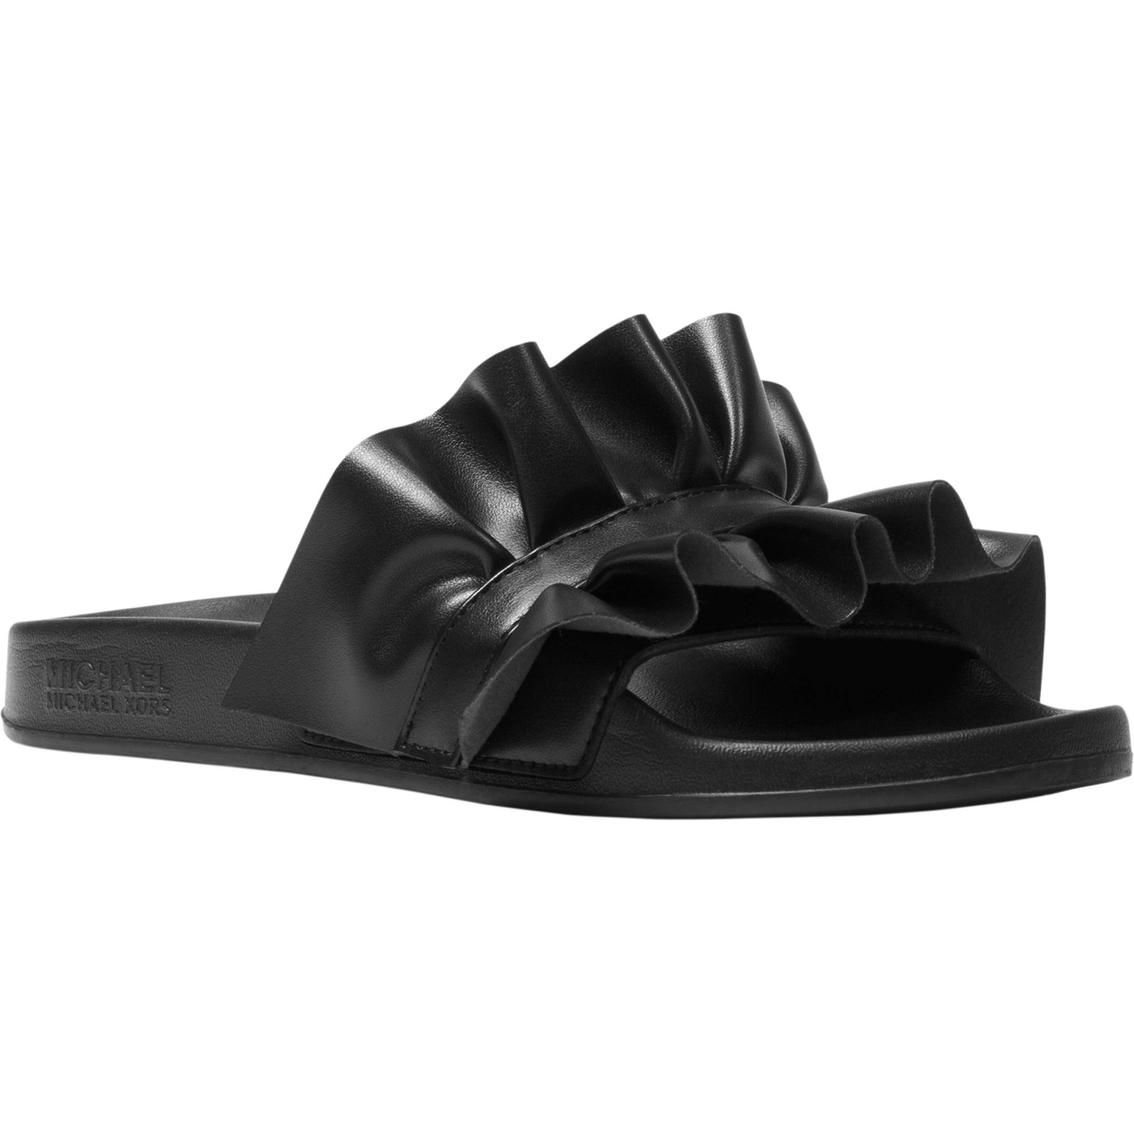 63f0d344872d Michael Kors Bella Sport Slide Sandals